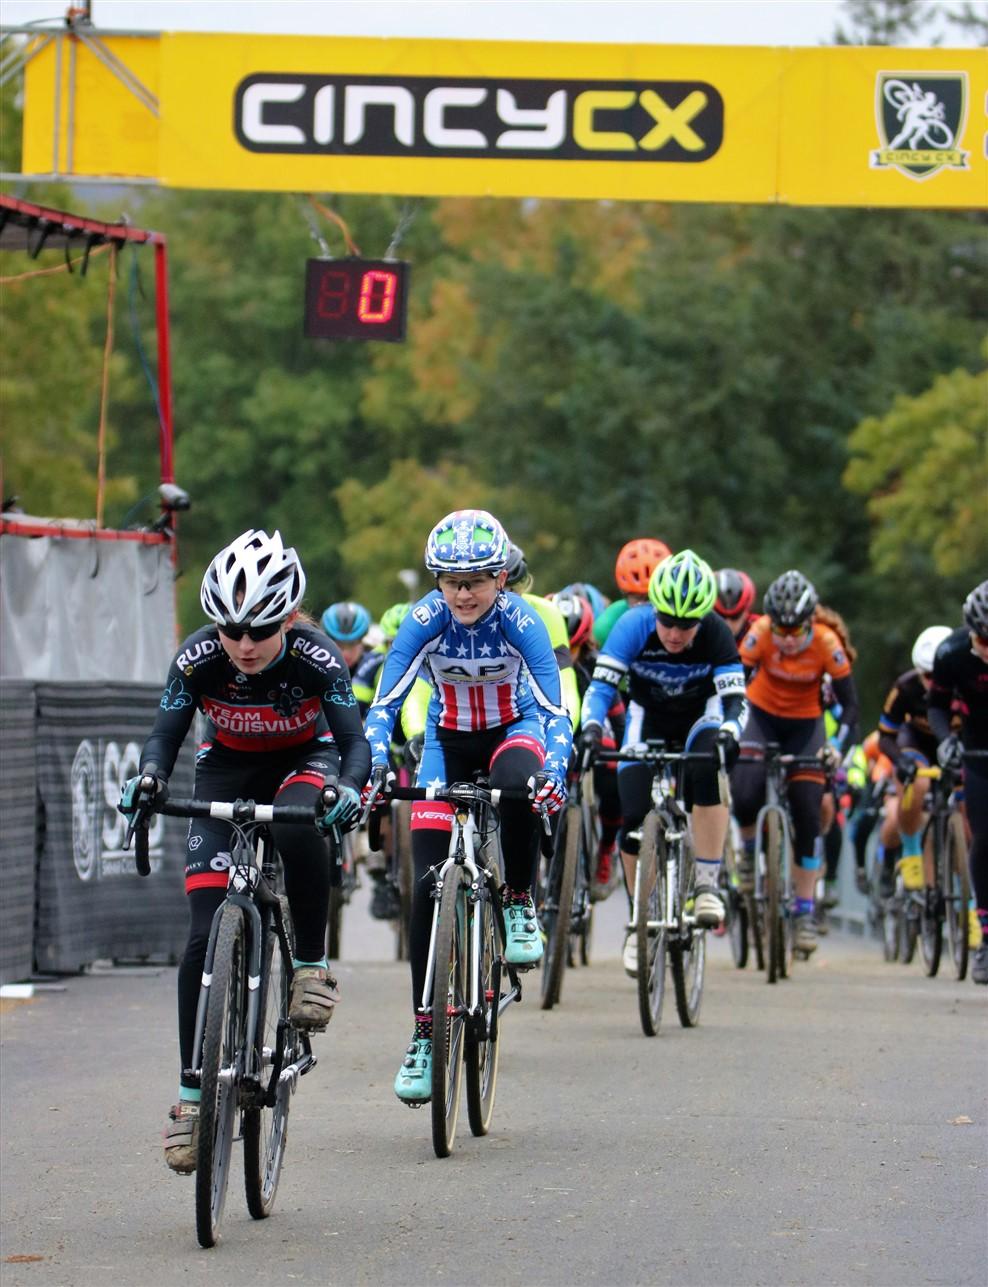 2017 10 29 66 Fairfield OH Cincinnati Cyclocross.jpg